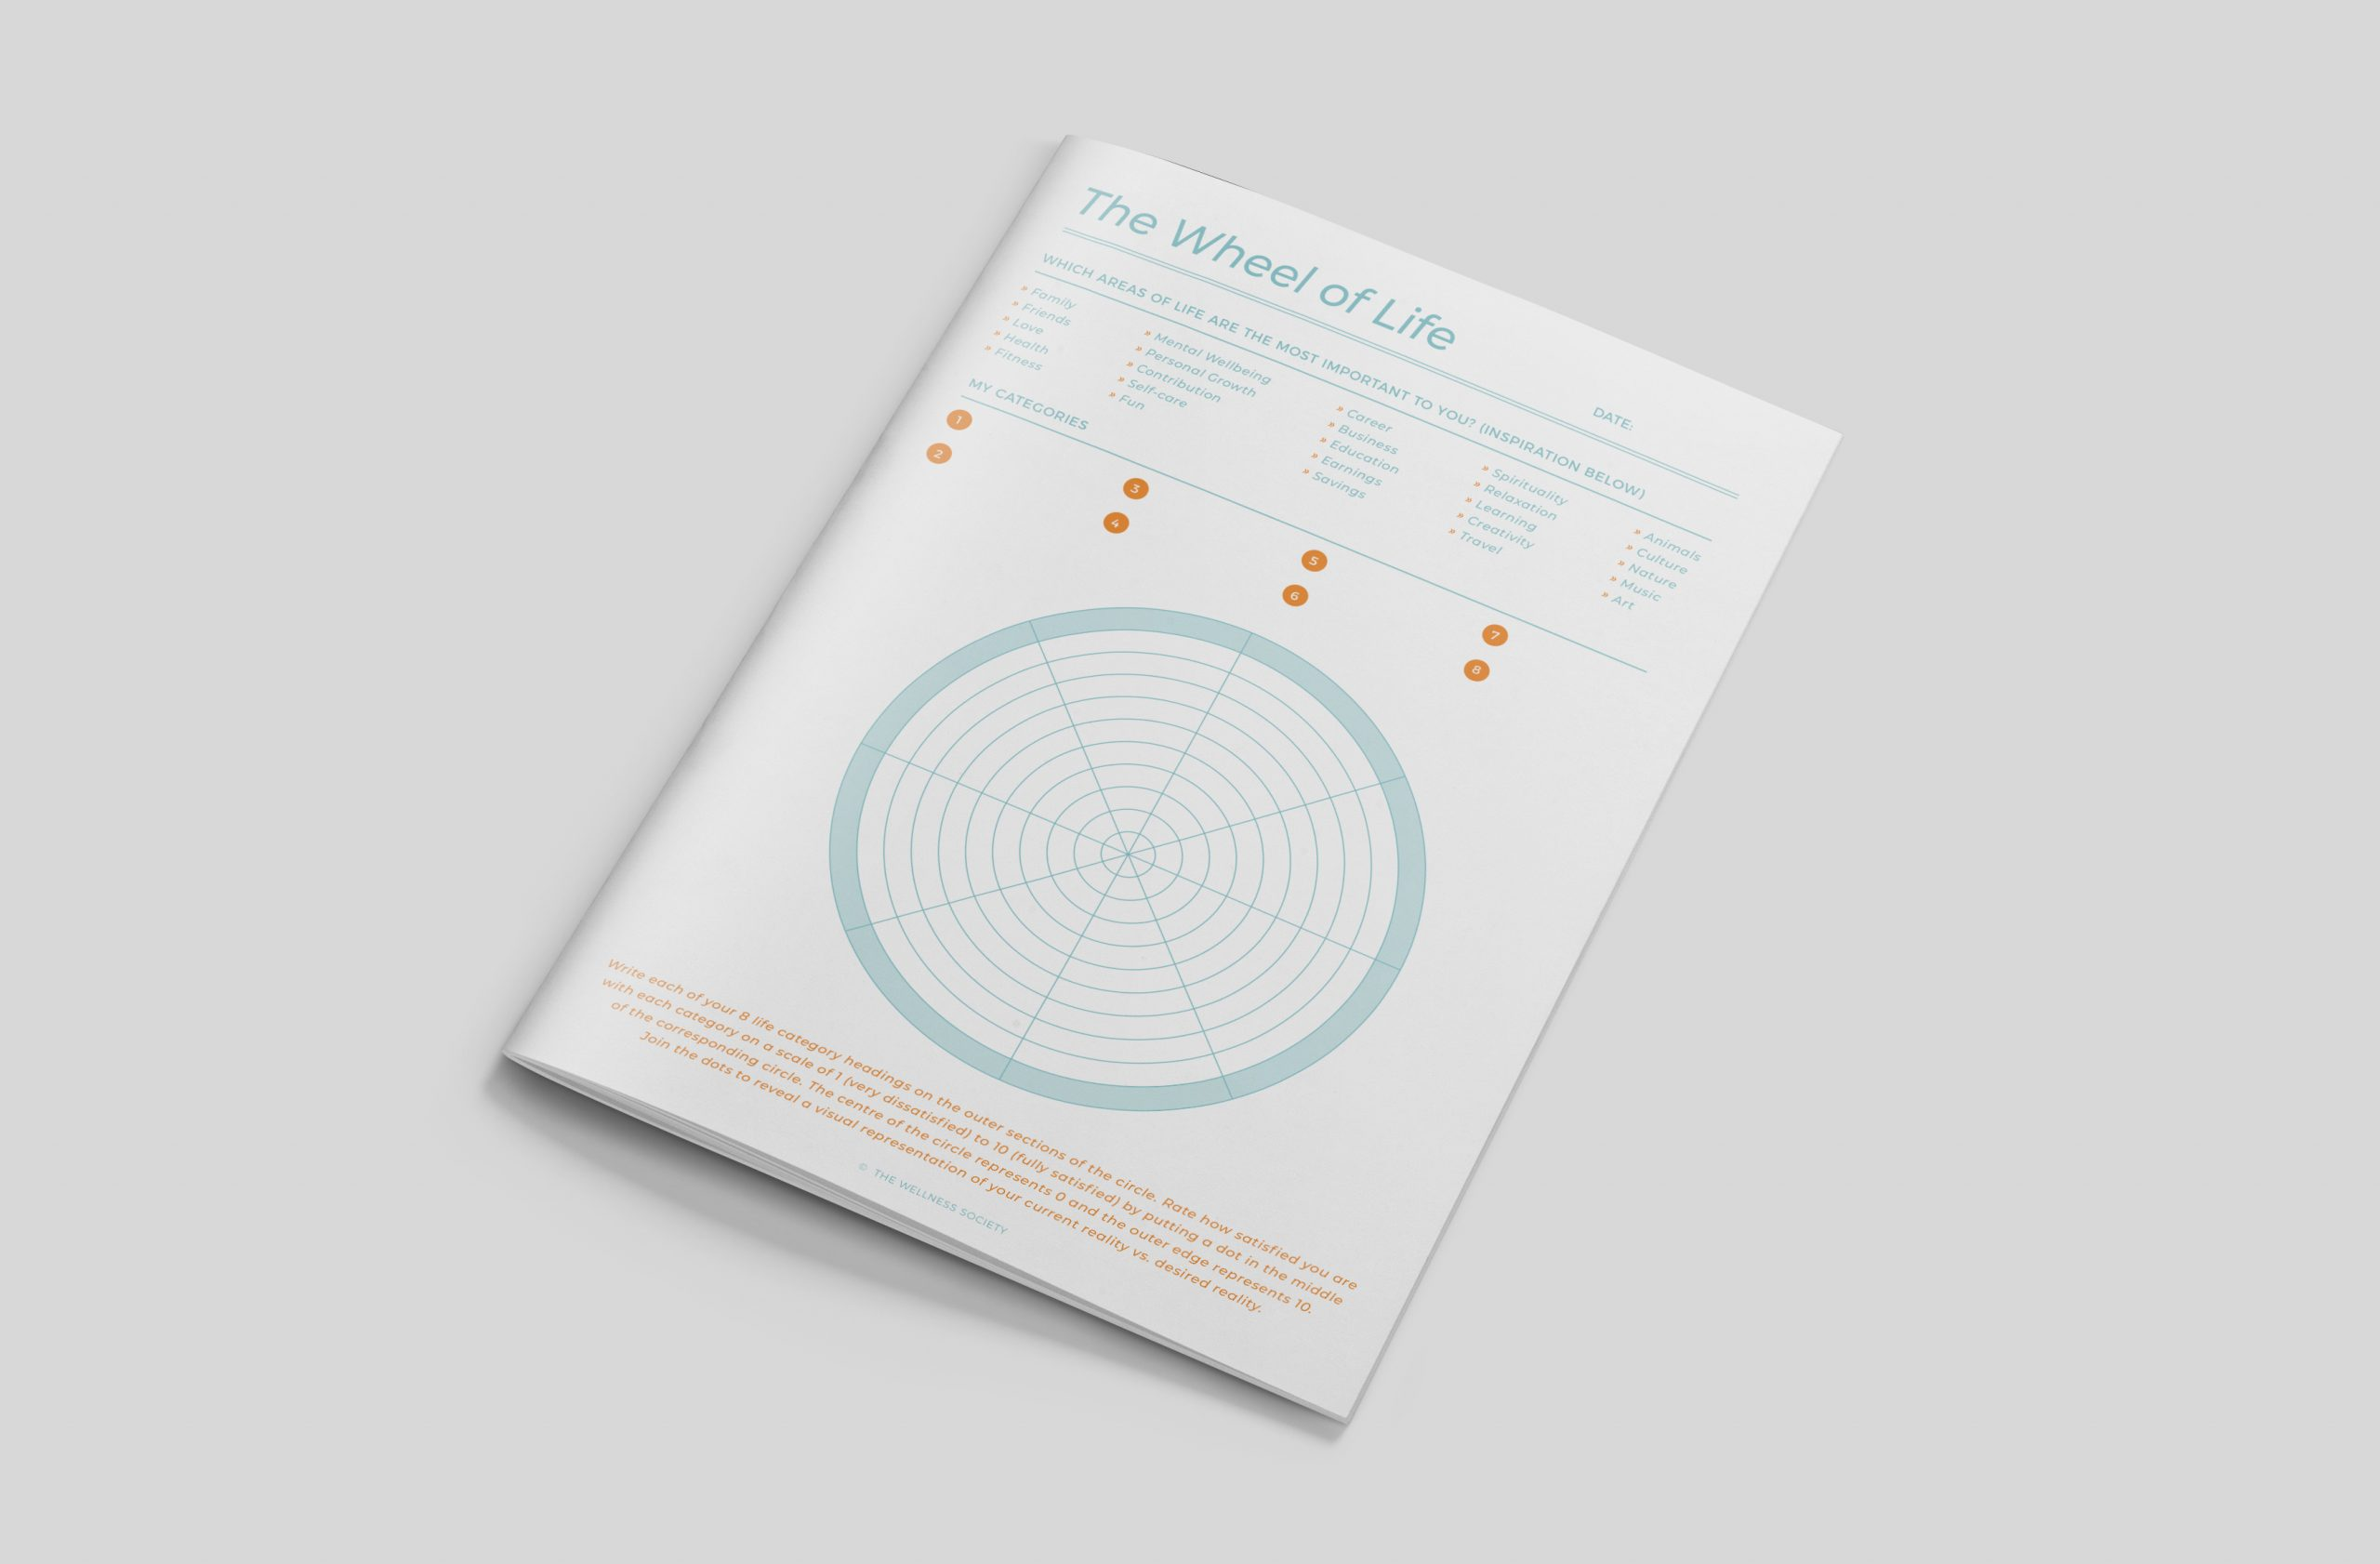 Wheel of Life Worksheets